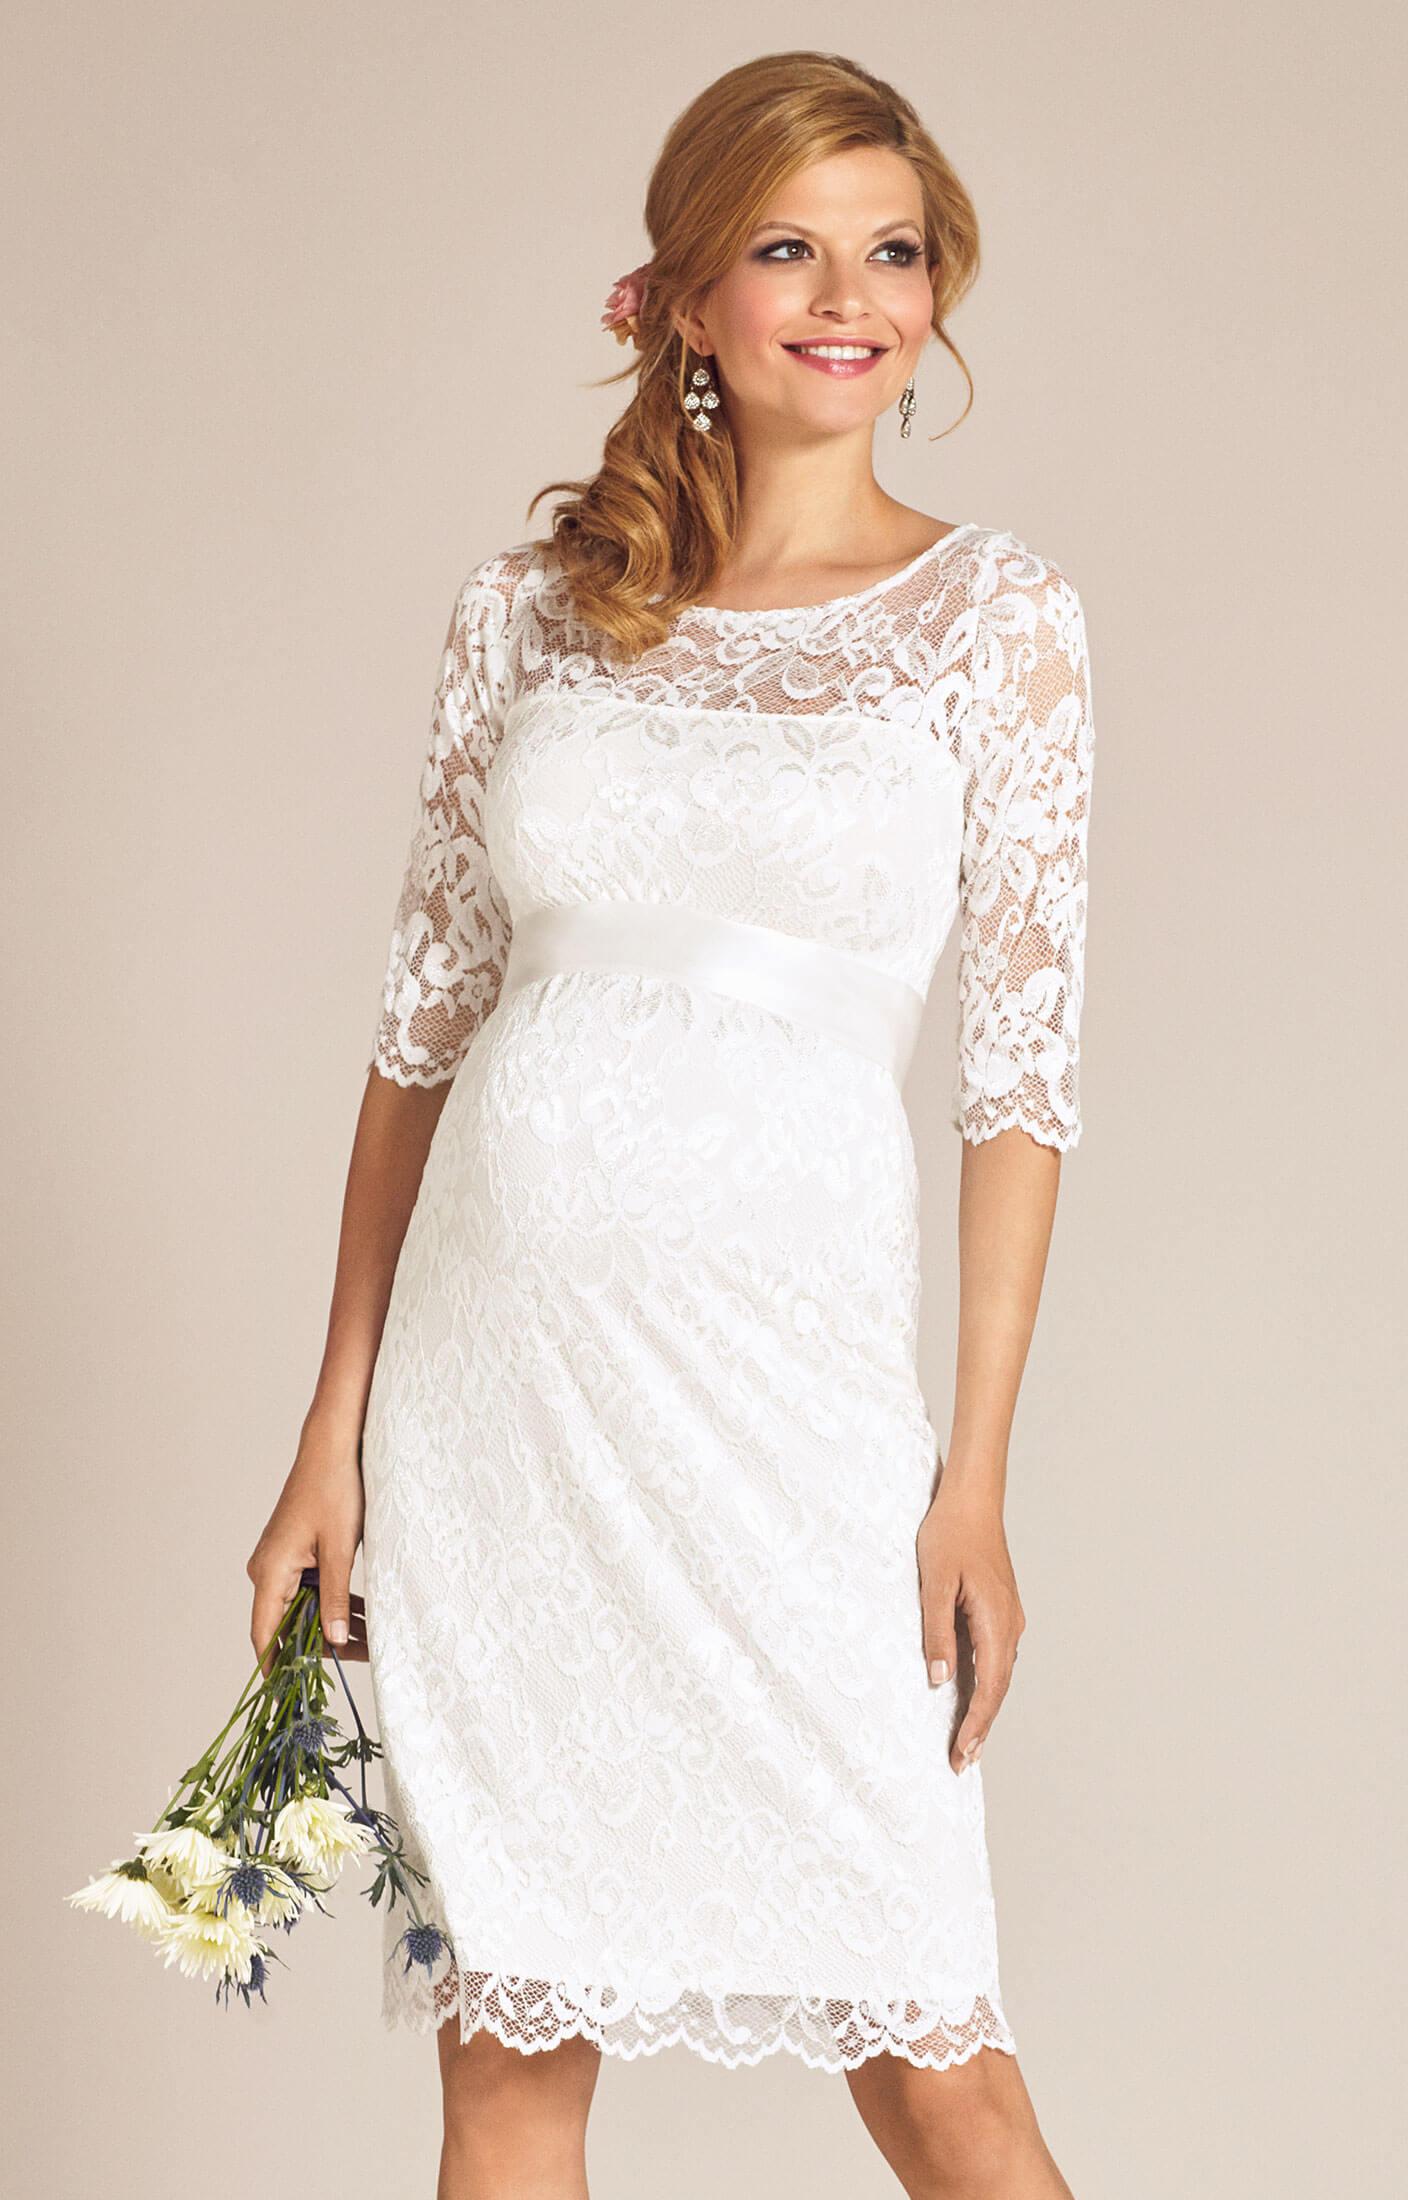 wedding dresses maternity dresses for weddings Amelia Lace Maternity Wedding Dress Short Ivory